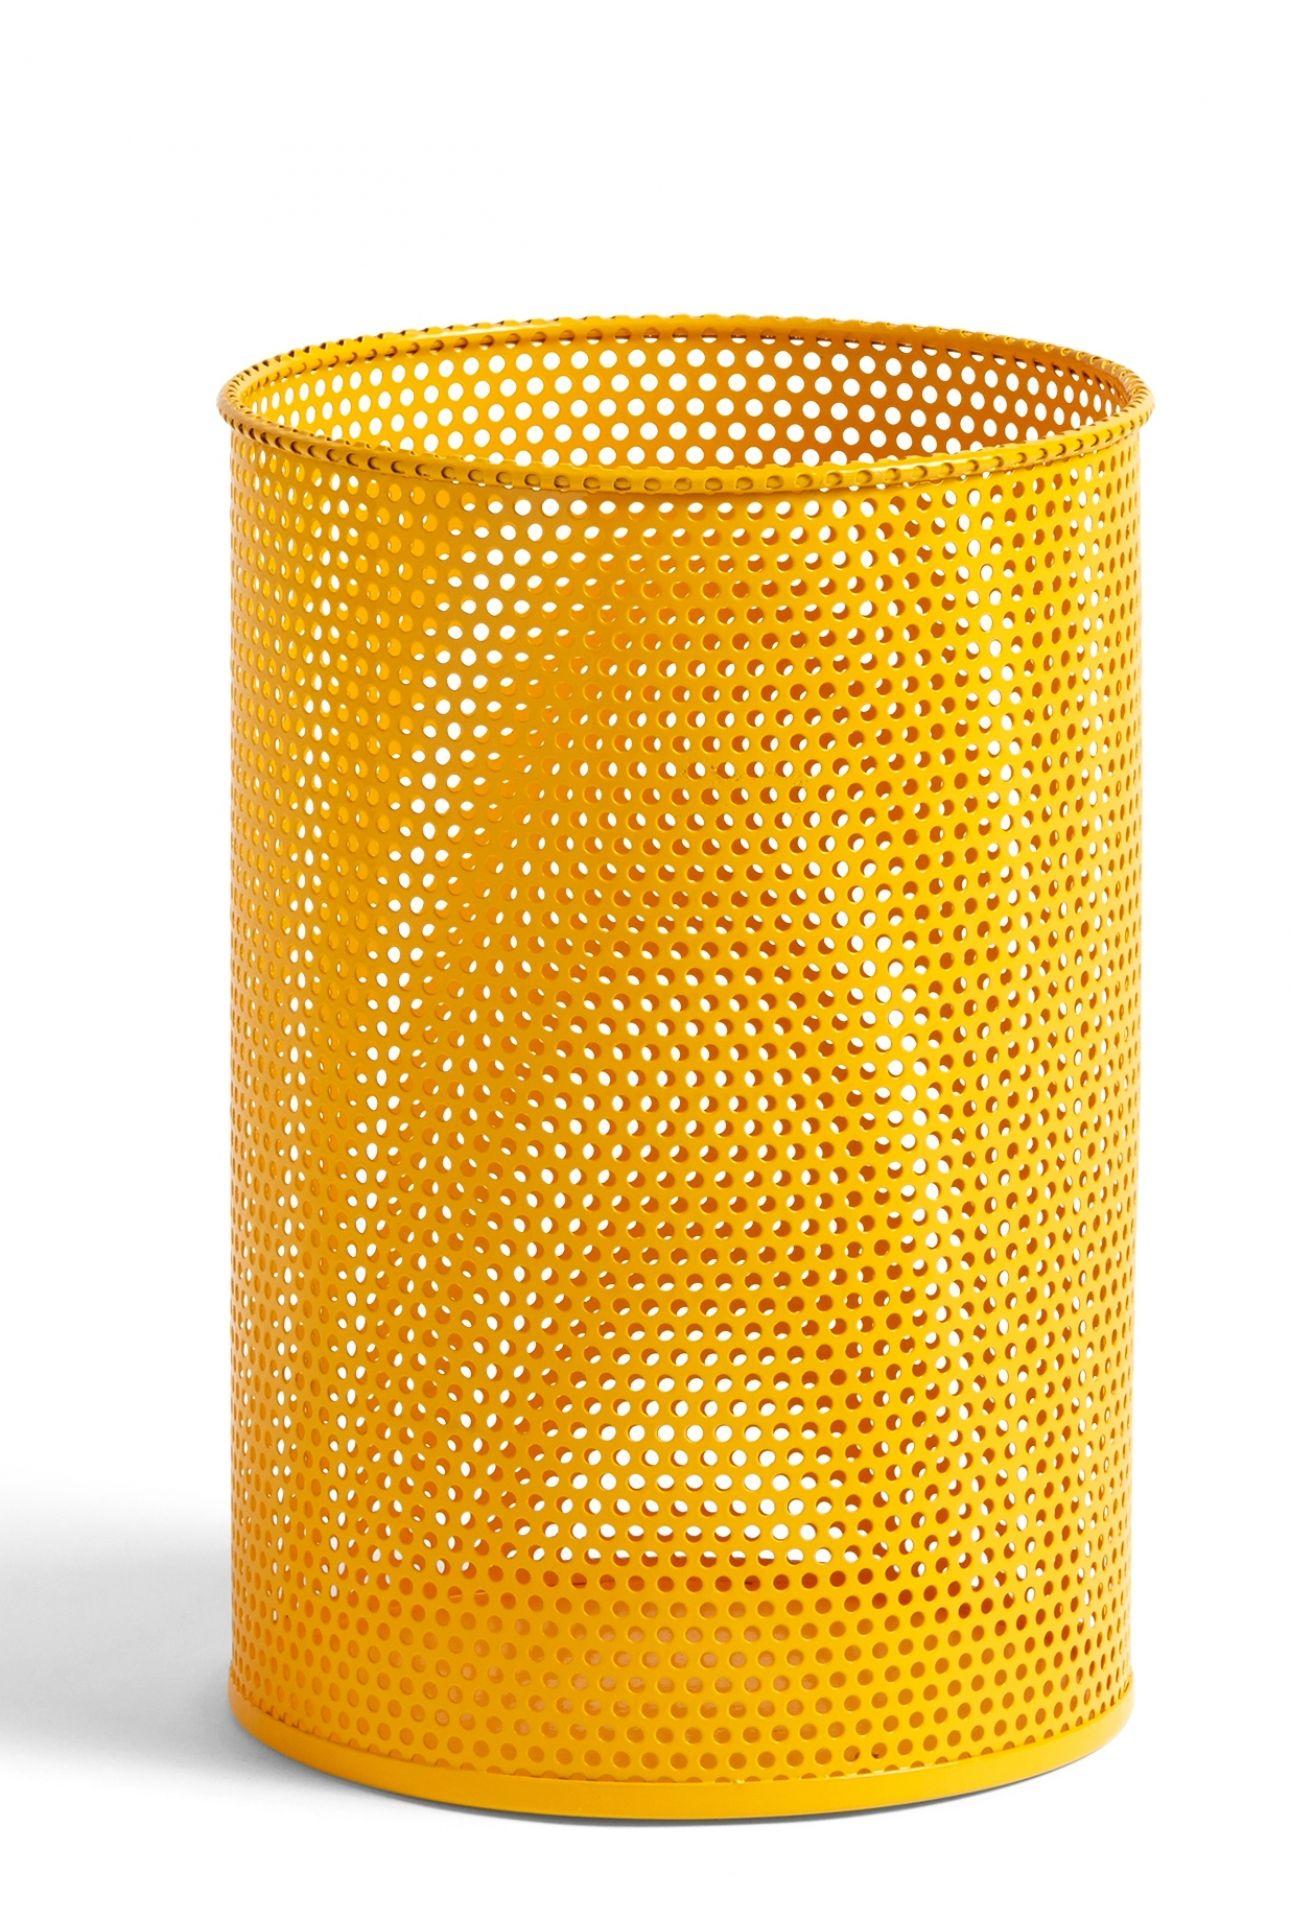 Perforated Bin M Hay Hay 507766